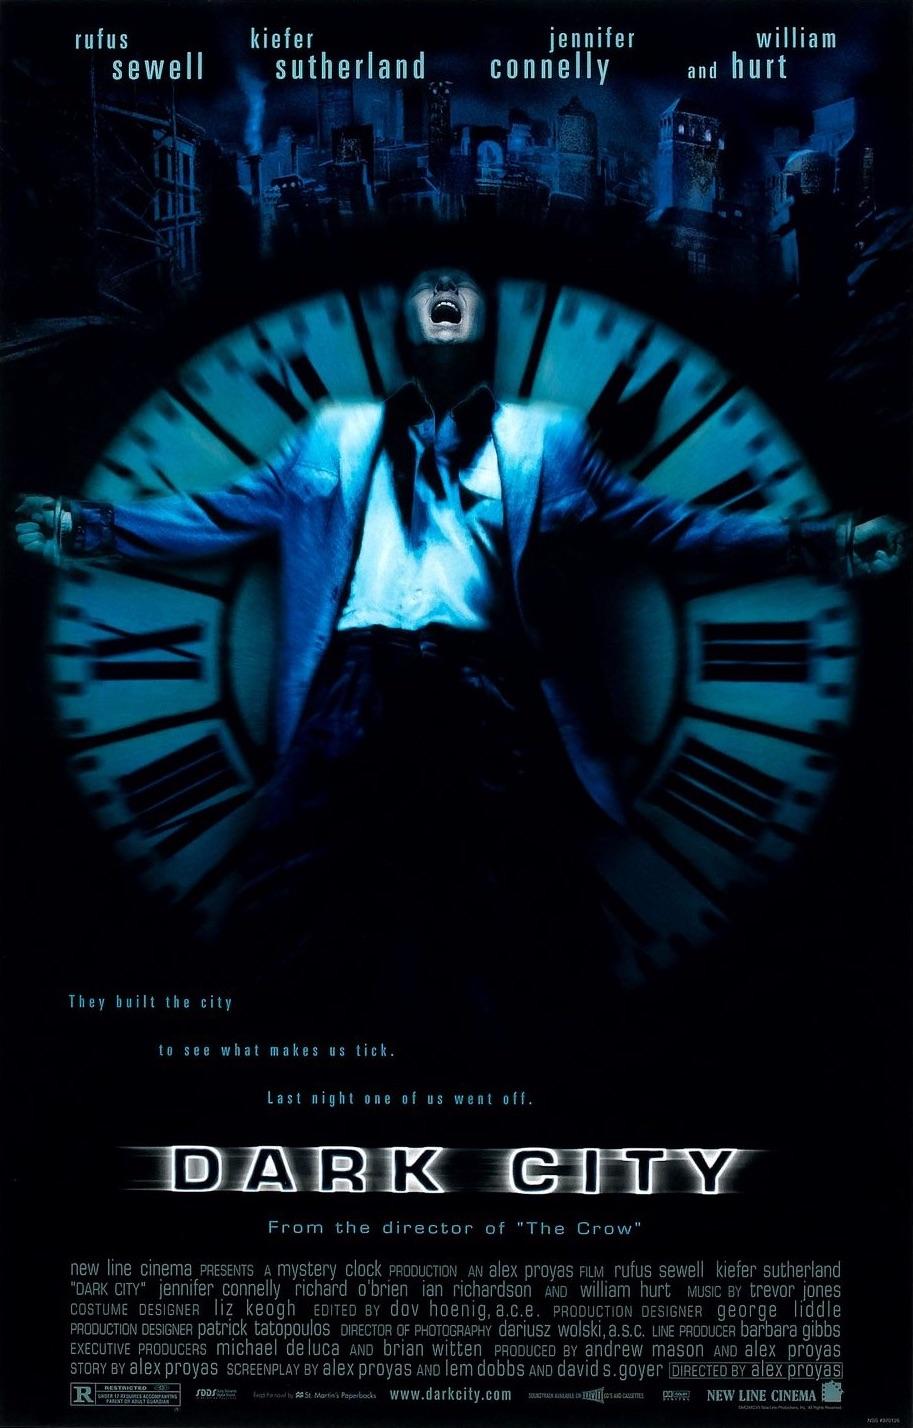 dark-city-poster.jpg